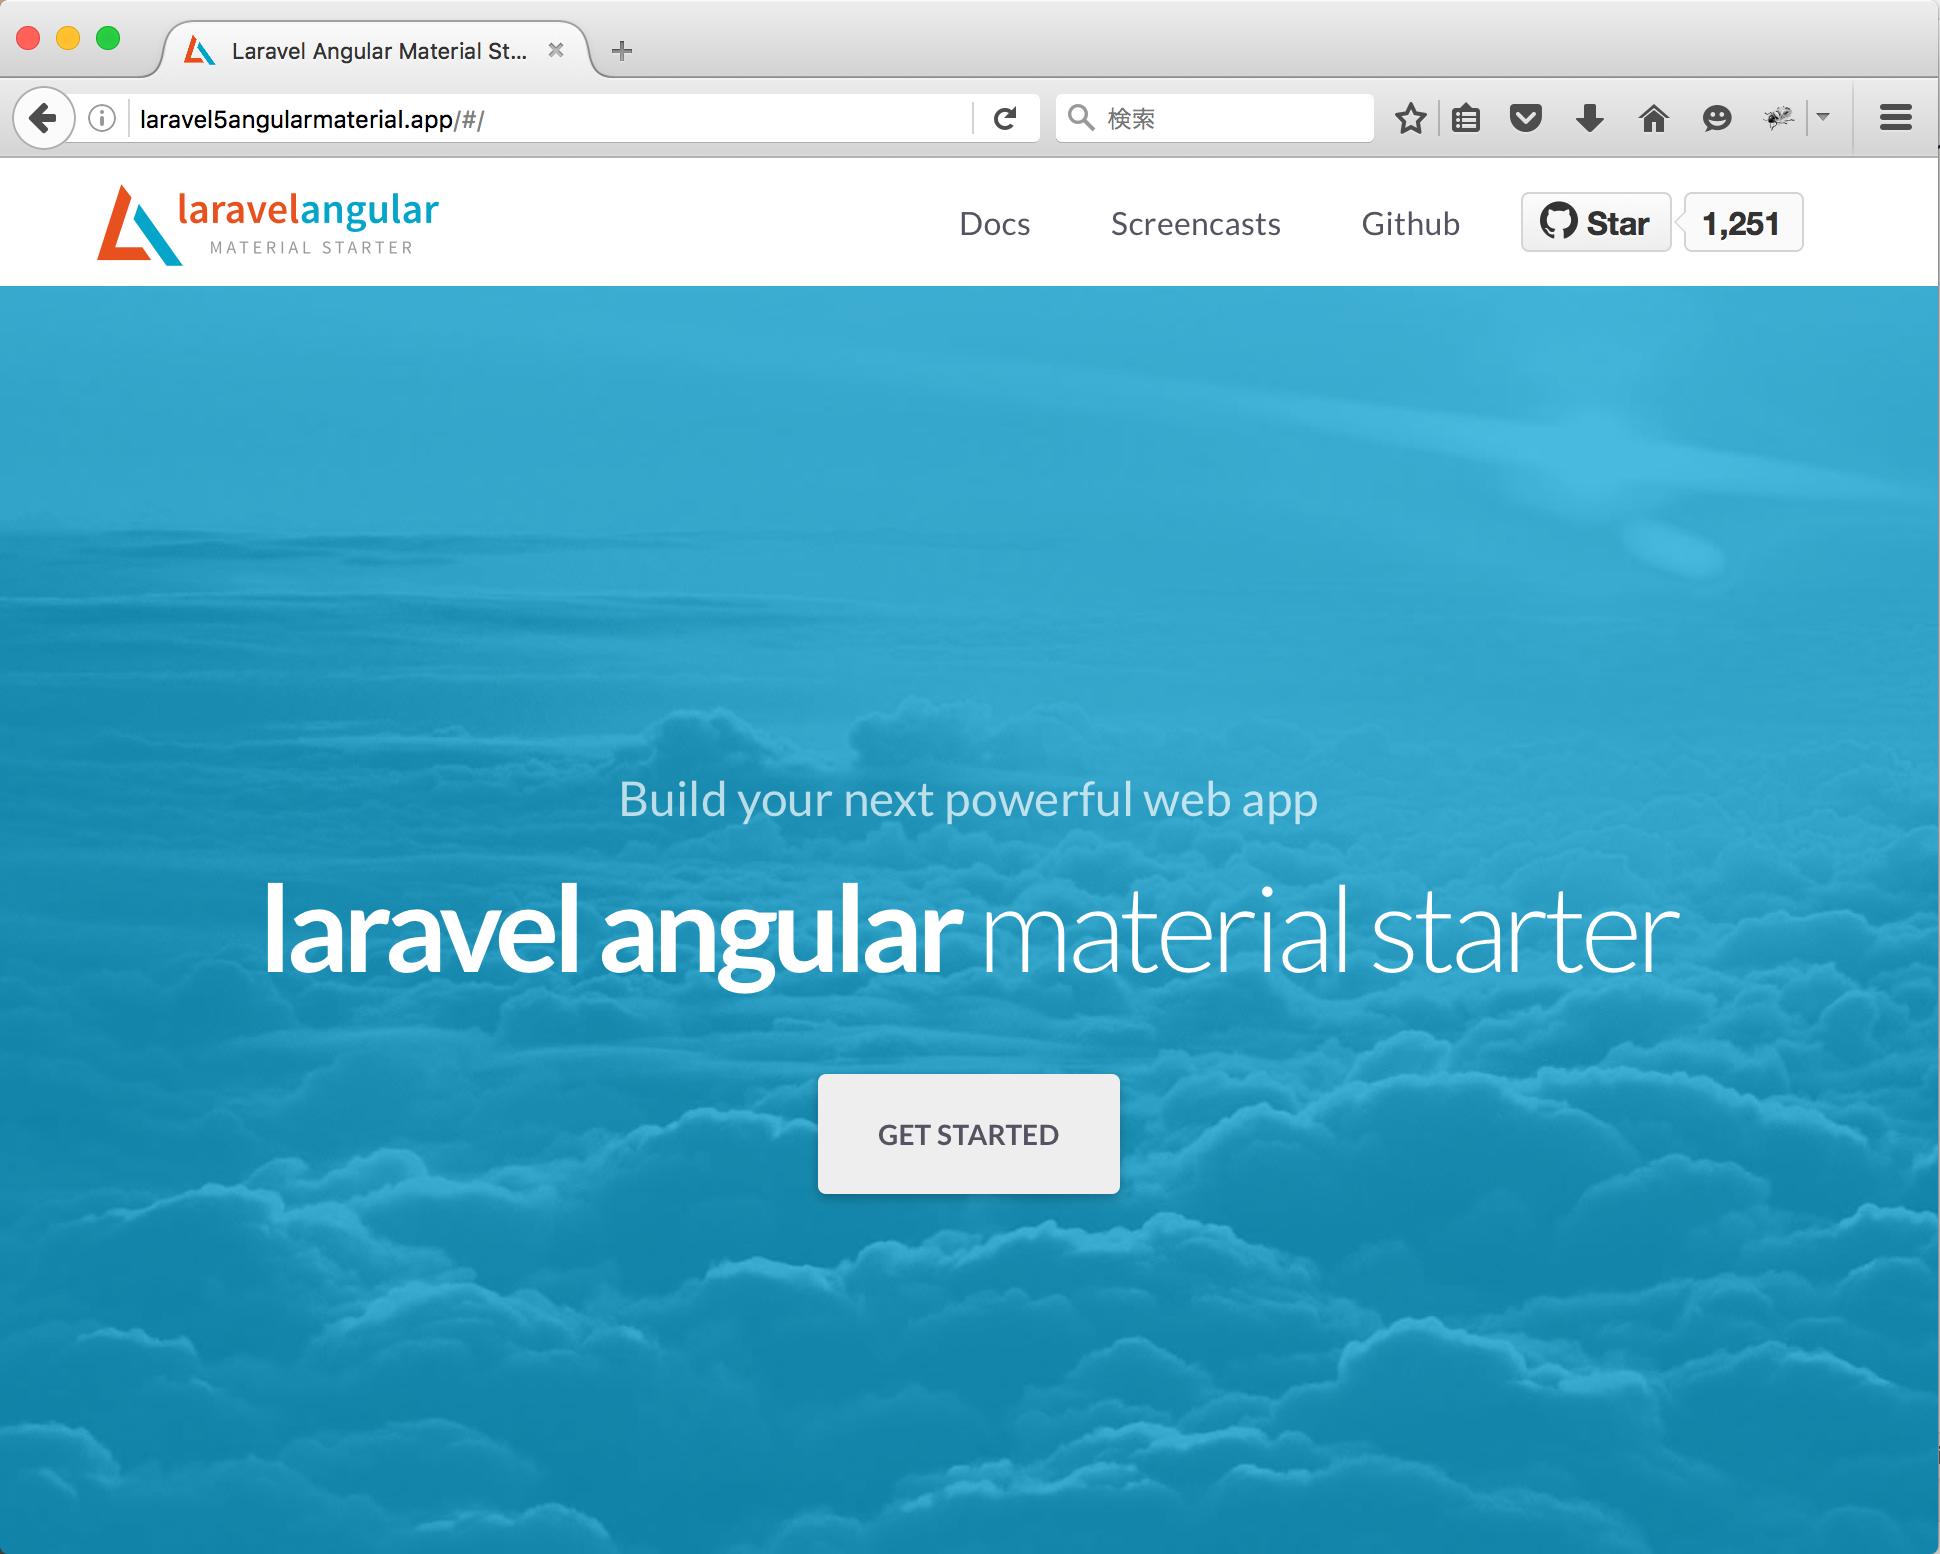 laravel-angular-material-starter-index-page